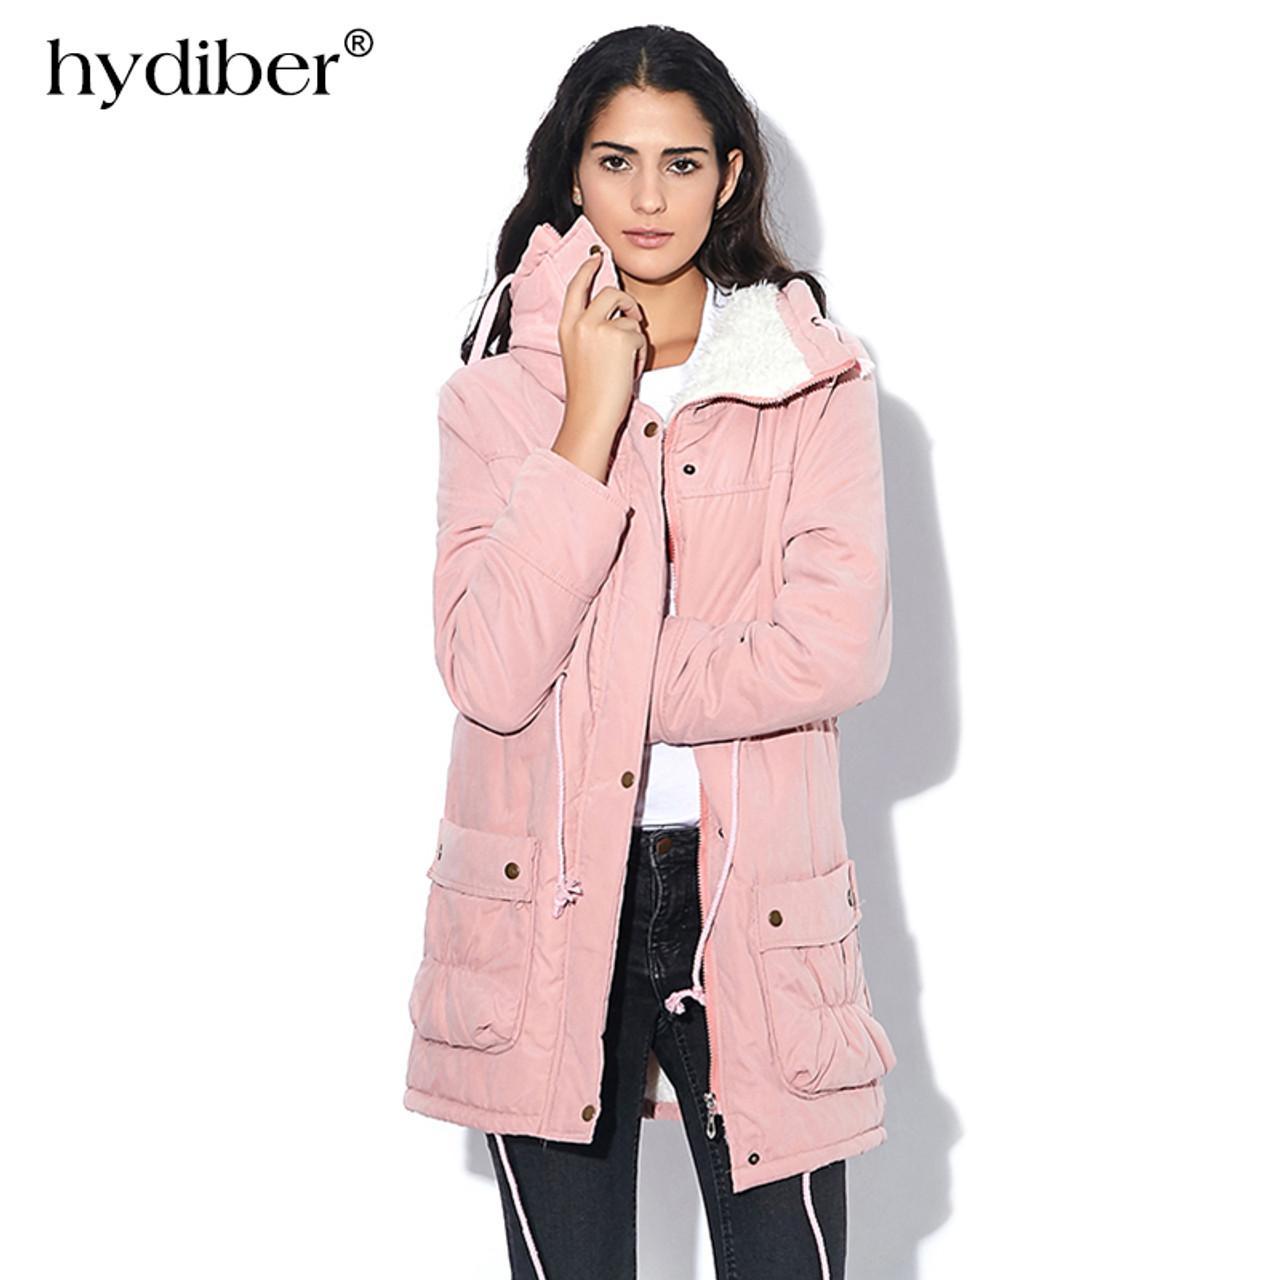 68b5fbf638356 New 2019 Winter Coat Women Slim Plus Size Outwear Medium-Long Wadded Jacket  Thick Hooded Cotton Fleece Warm Cotton Parka - OnshopDeals.Com